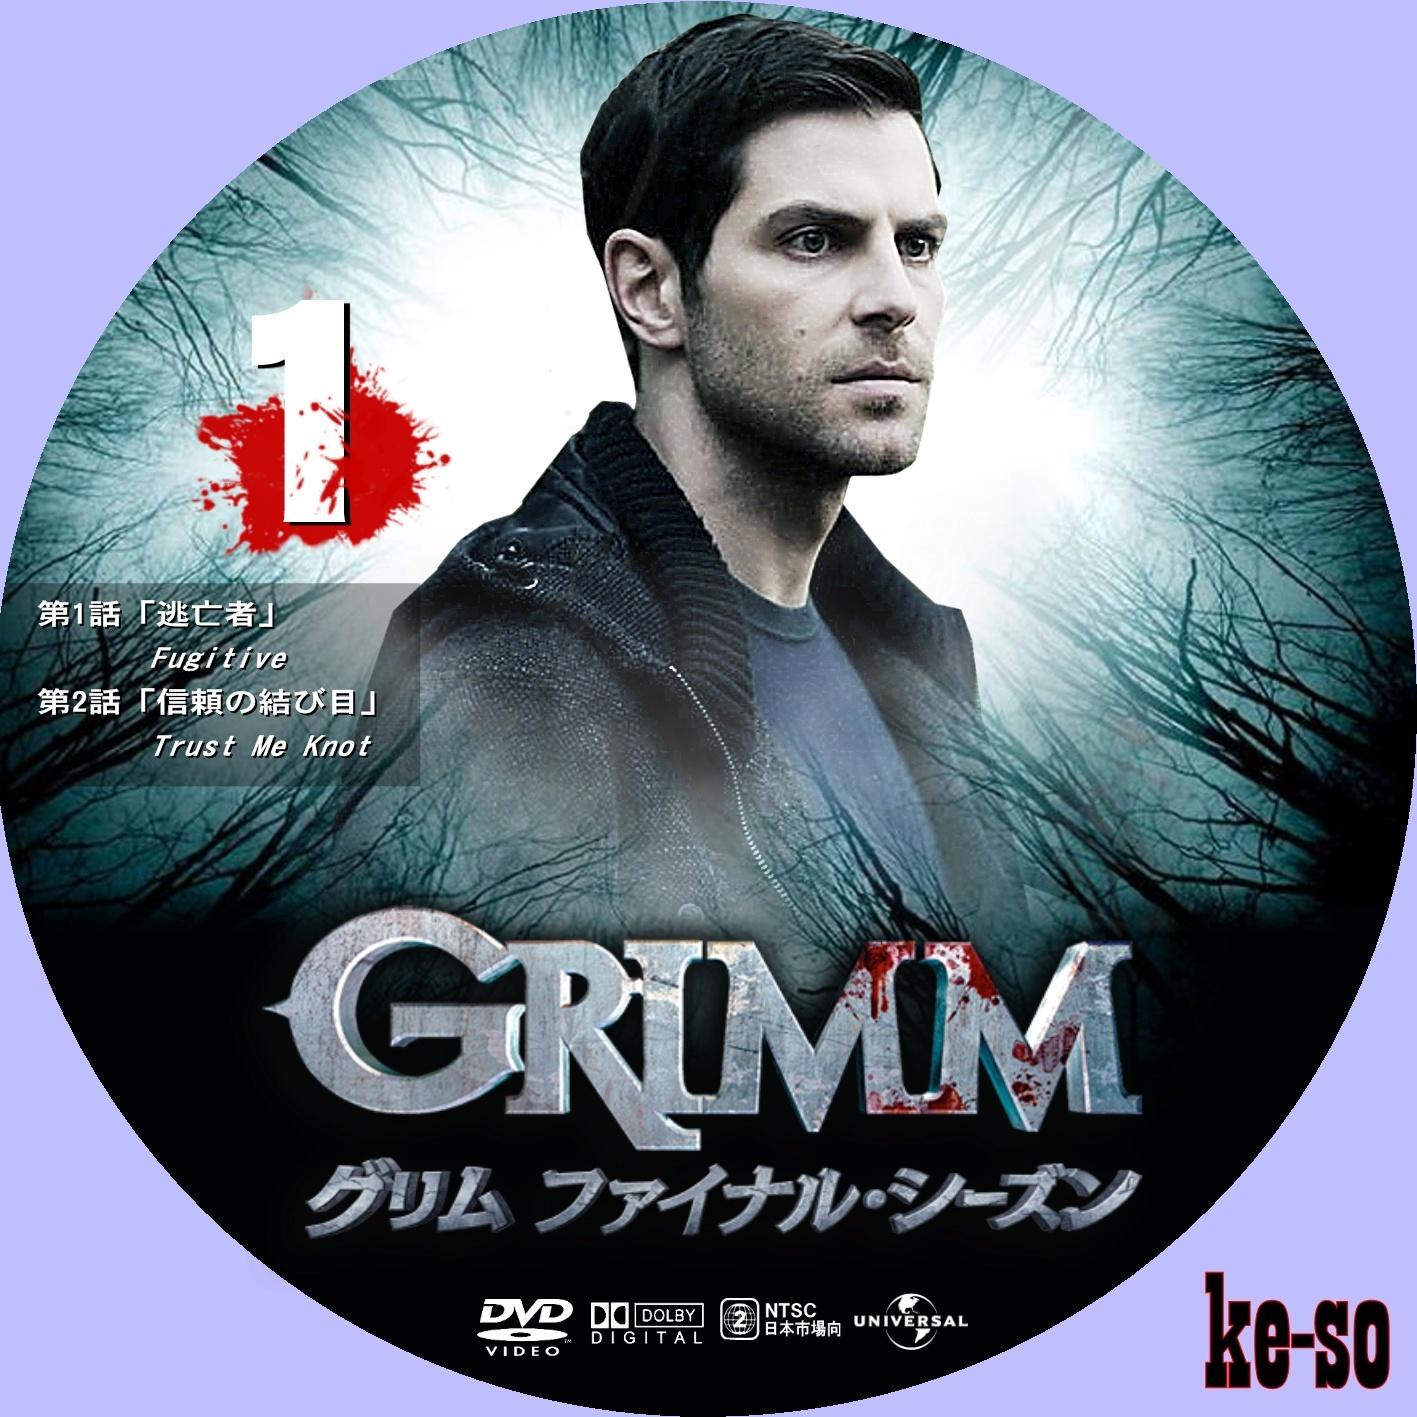 【DVDラベル】海外テレビドラマの自作DVDラベル …